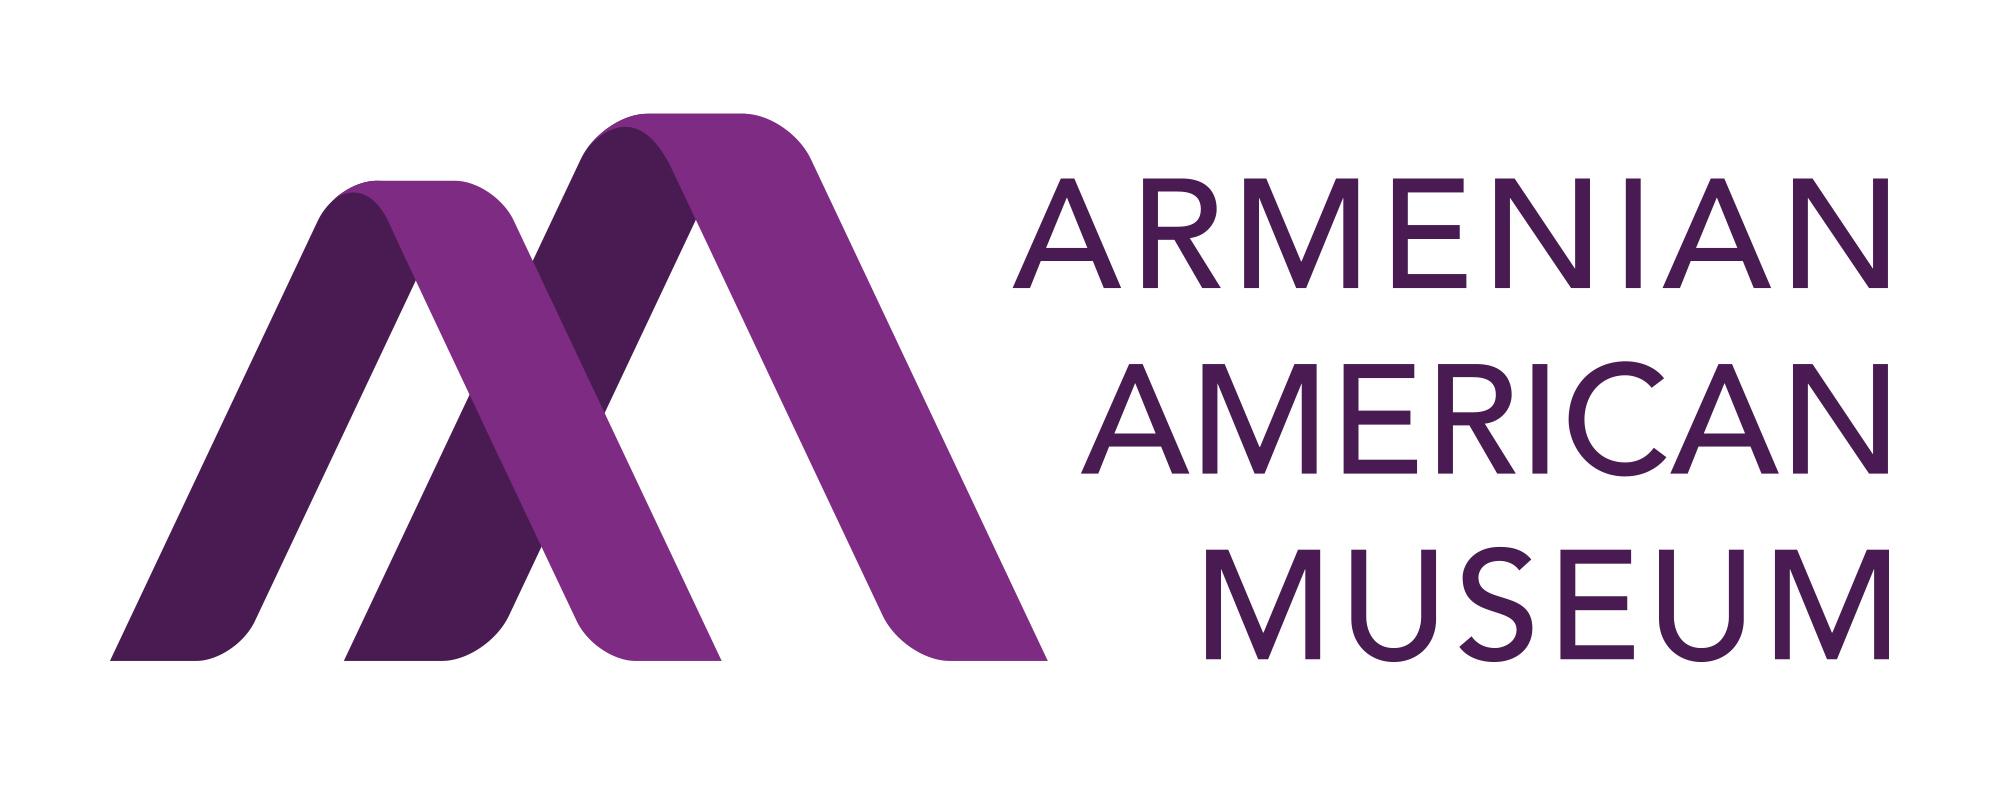 Armenian American Museum Logo Social